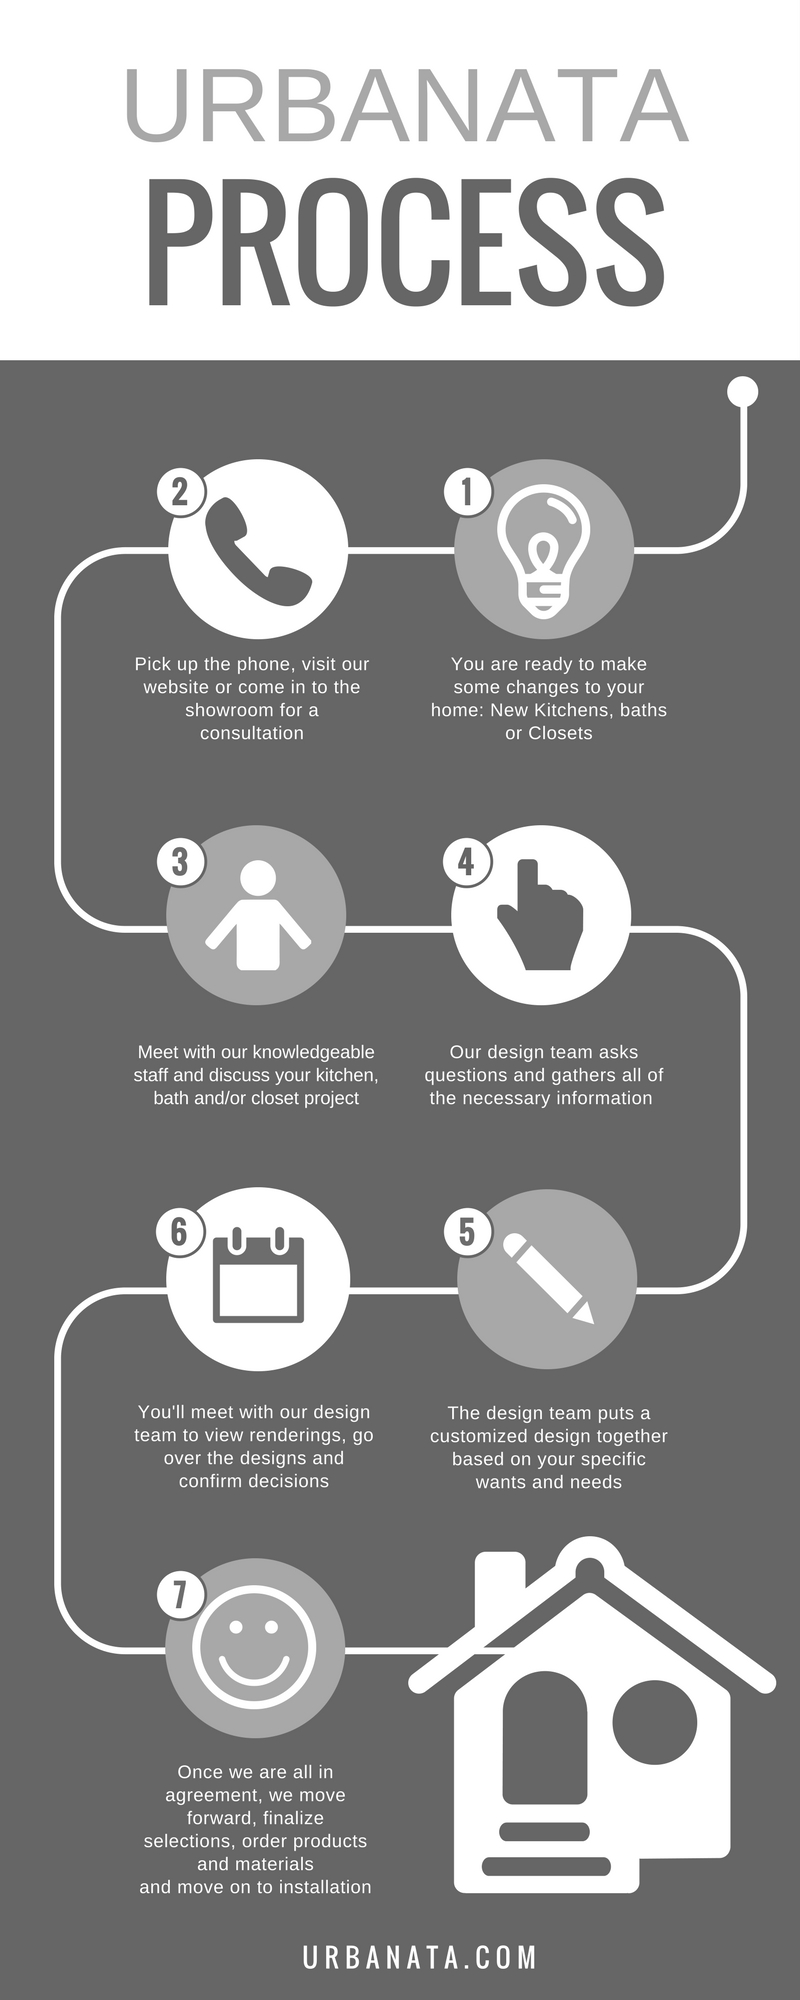 The Urbanata Process (2).jpg